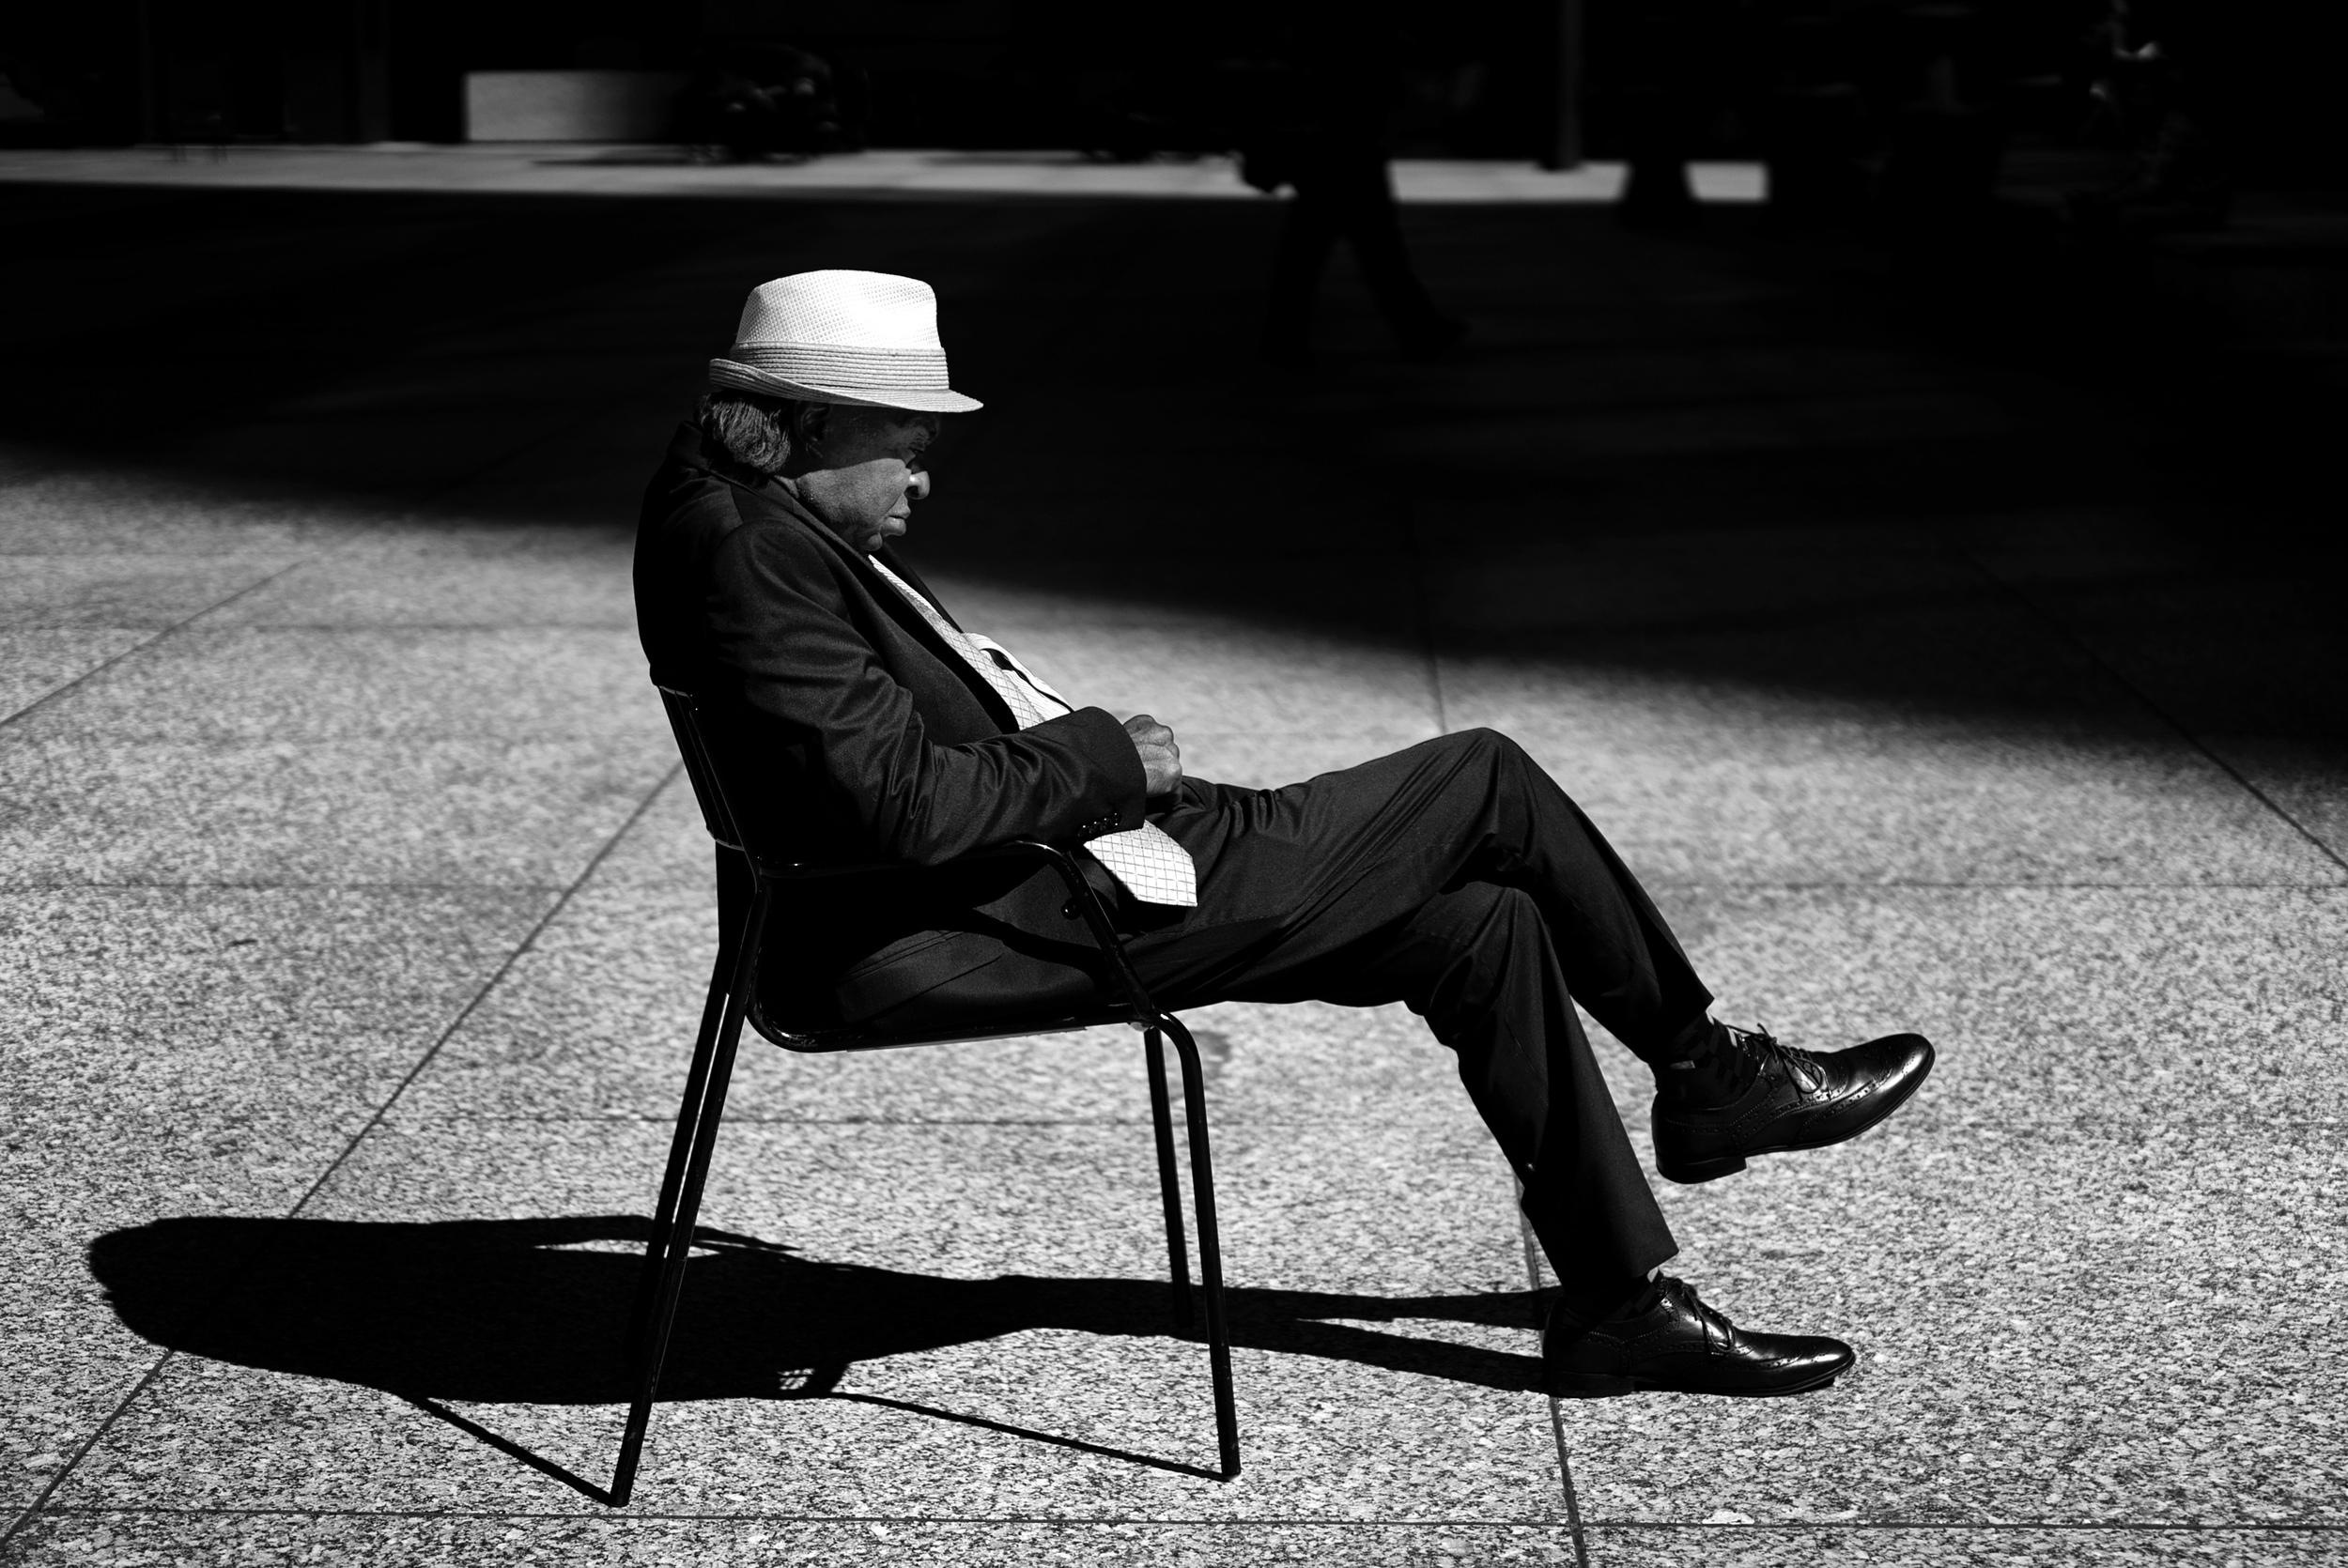 man-sleeping-daly-center-plaza-chicago.jpg